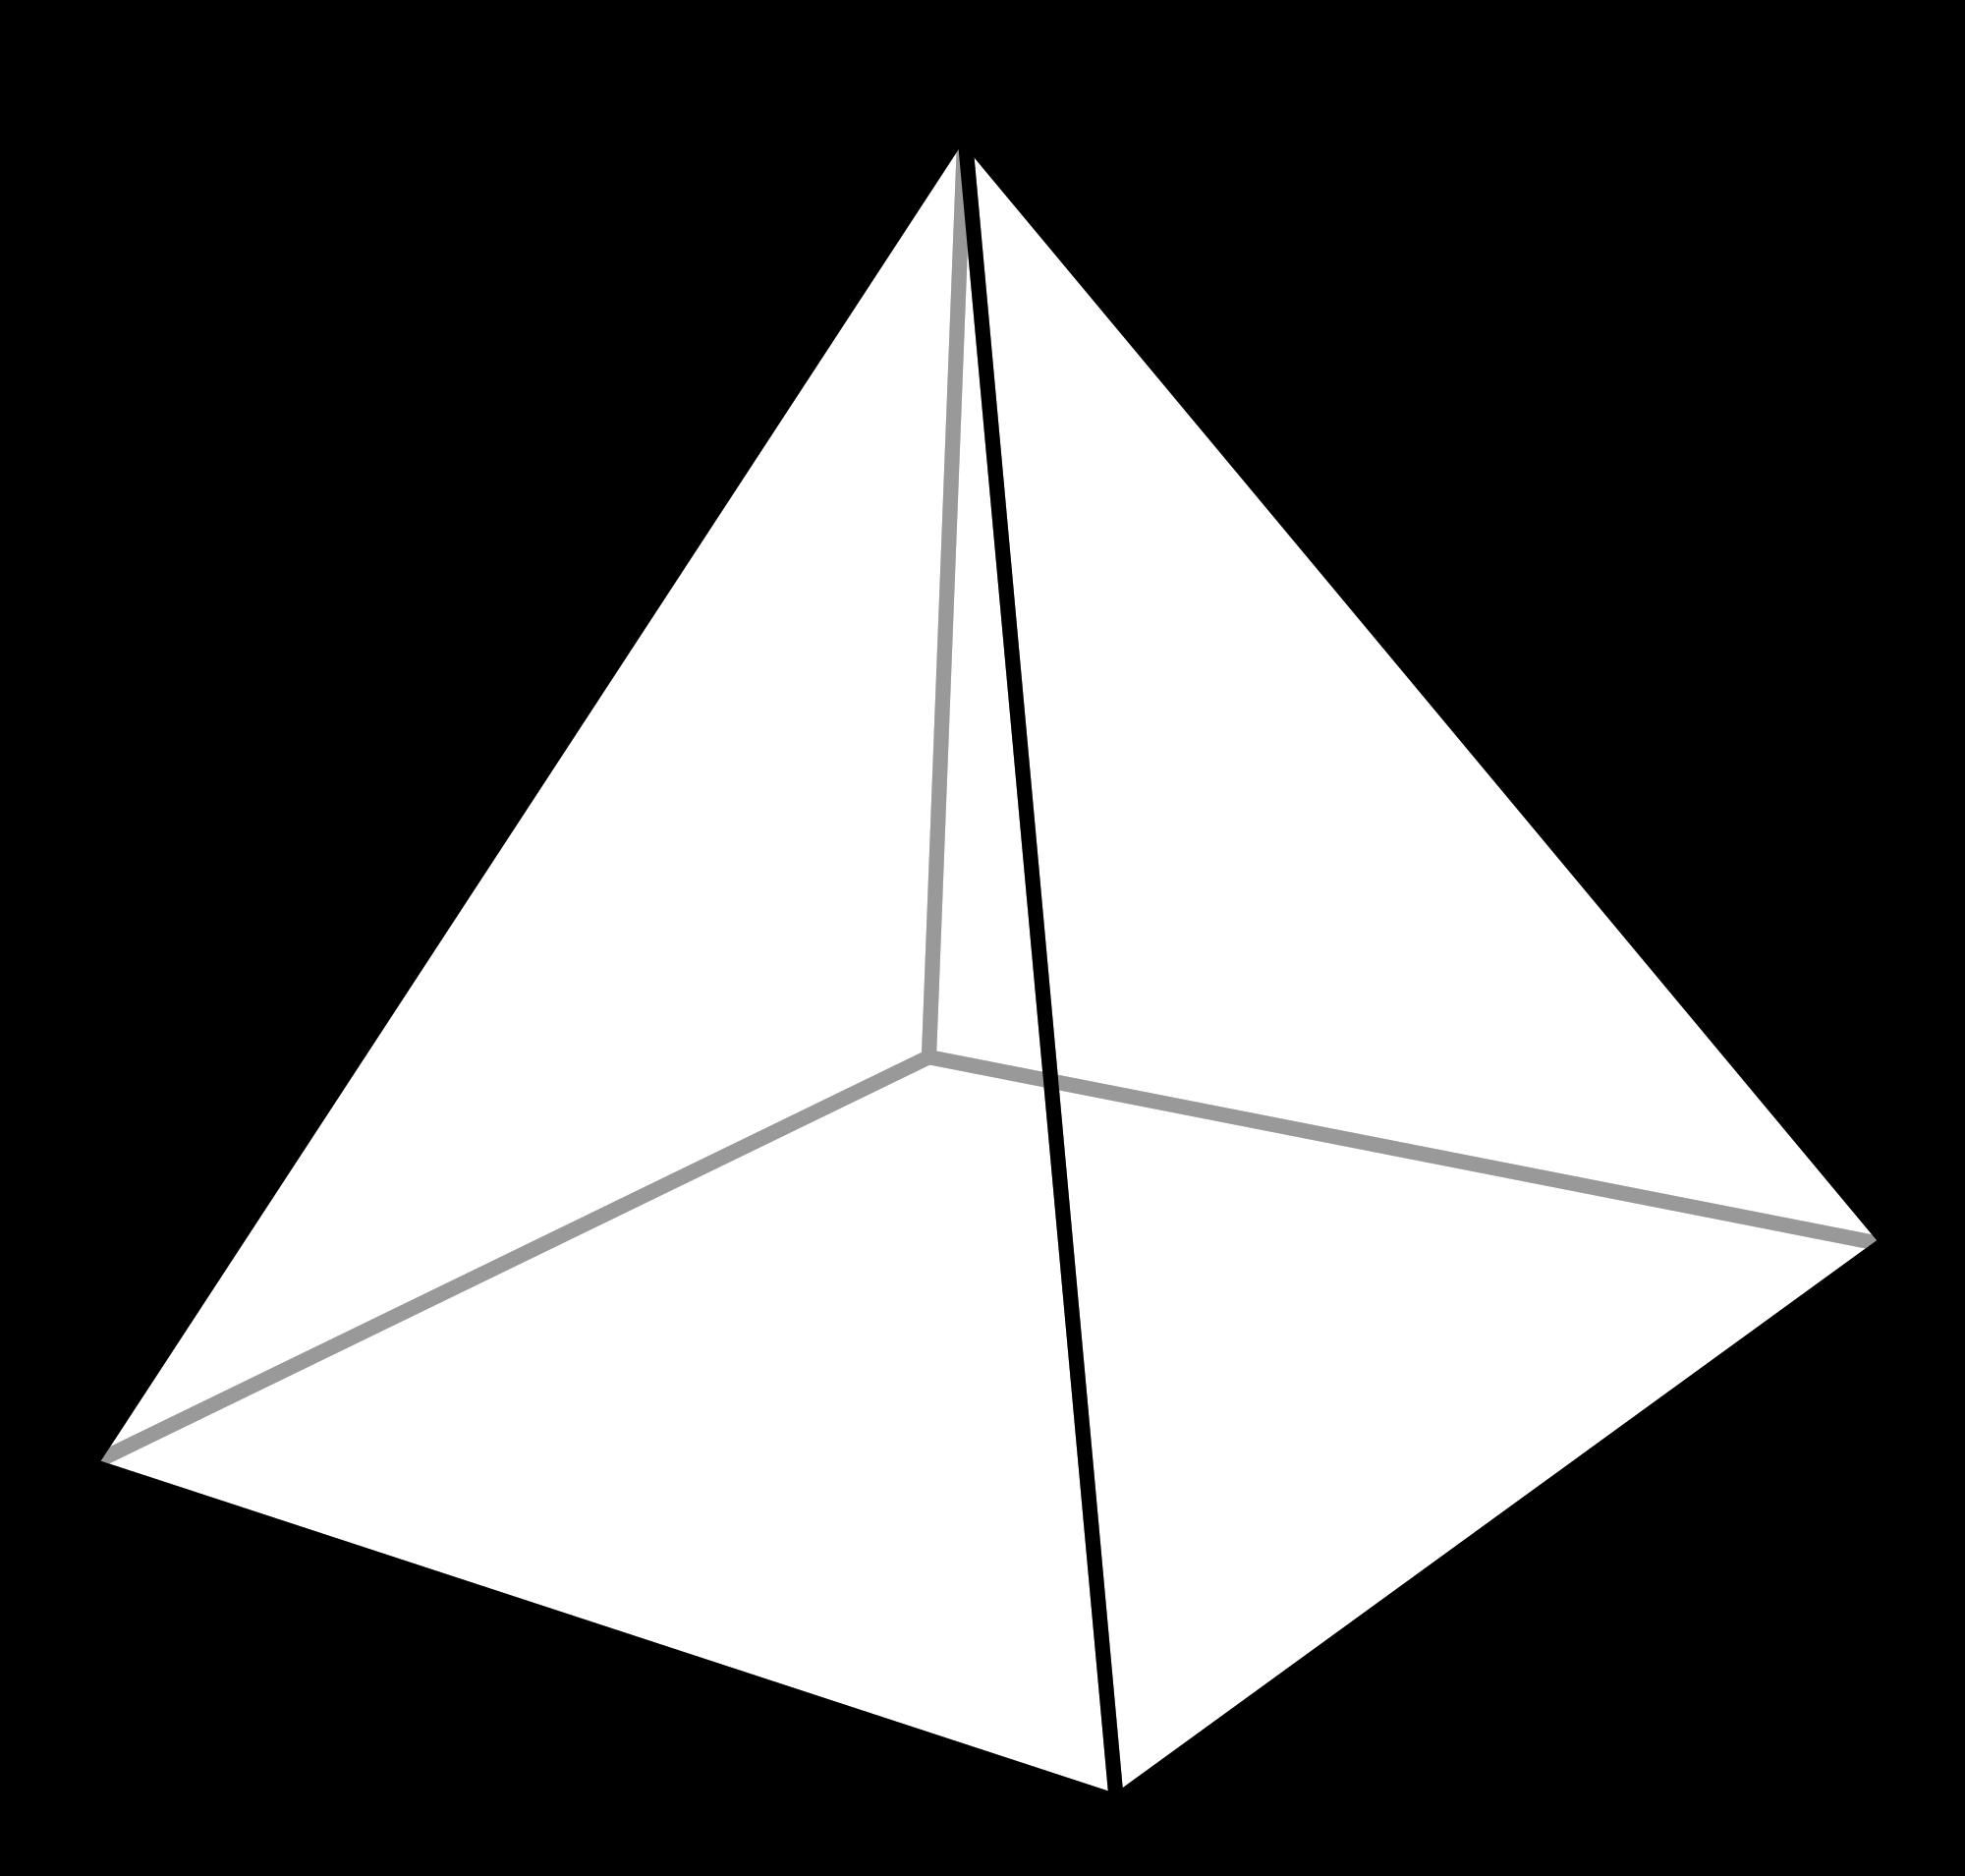 Cone 3d pyramid